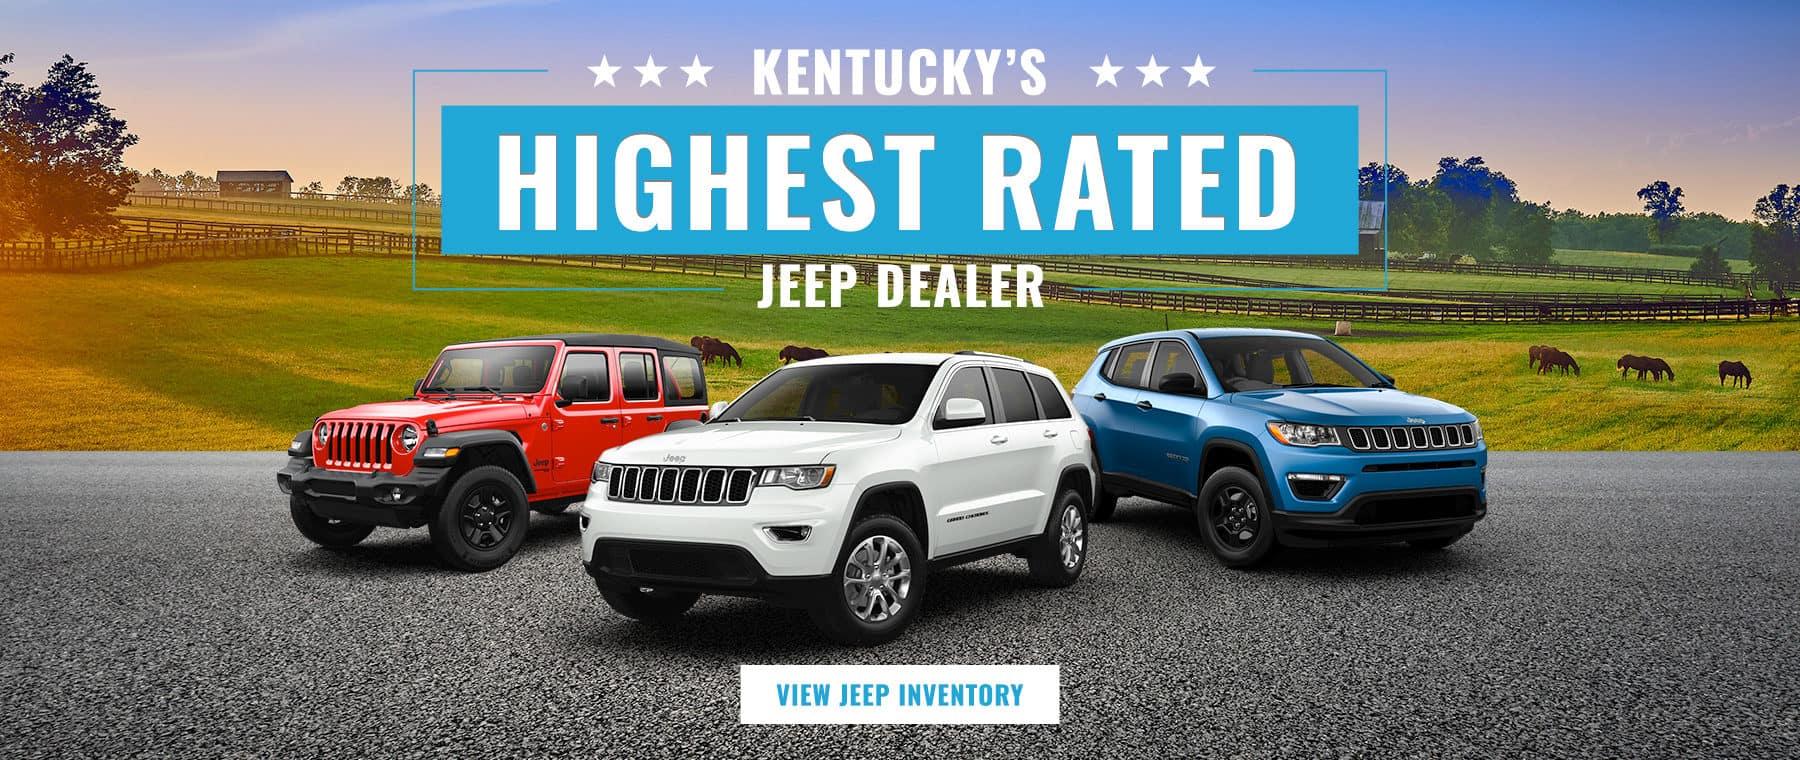 Kentucky's Highest Rated Jeep Dealer